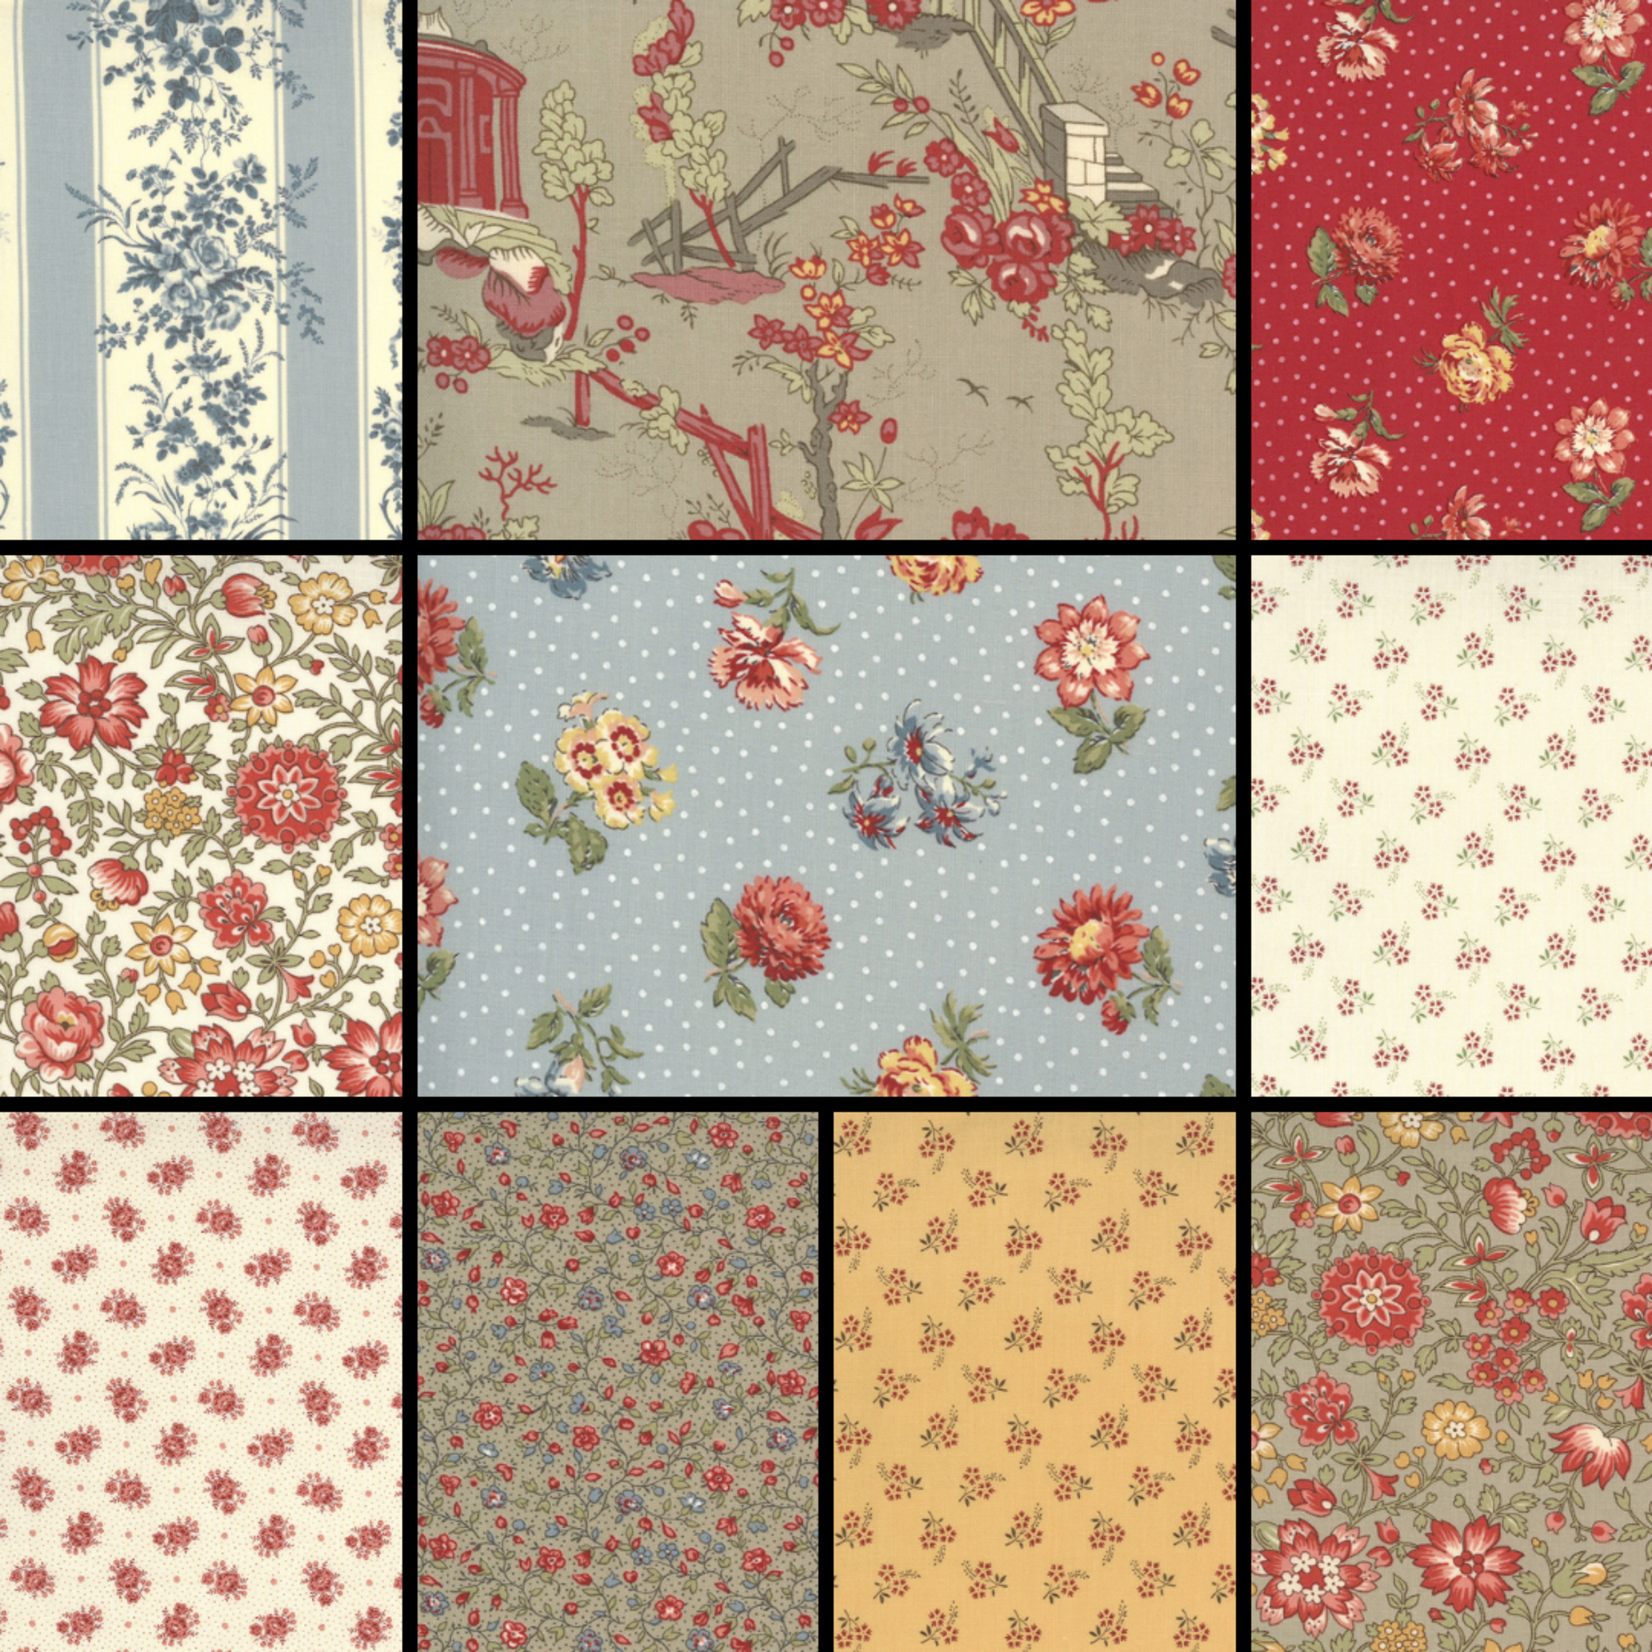 FRENCH GENERAL Jardins De Fleurs - 1/2 Meter Bundle Prints - 32 Pcs